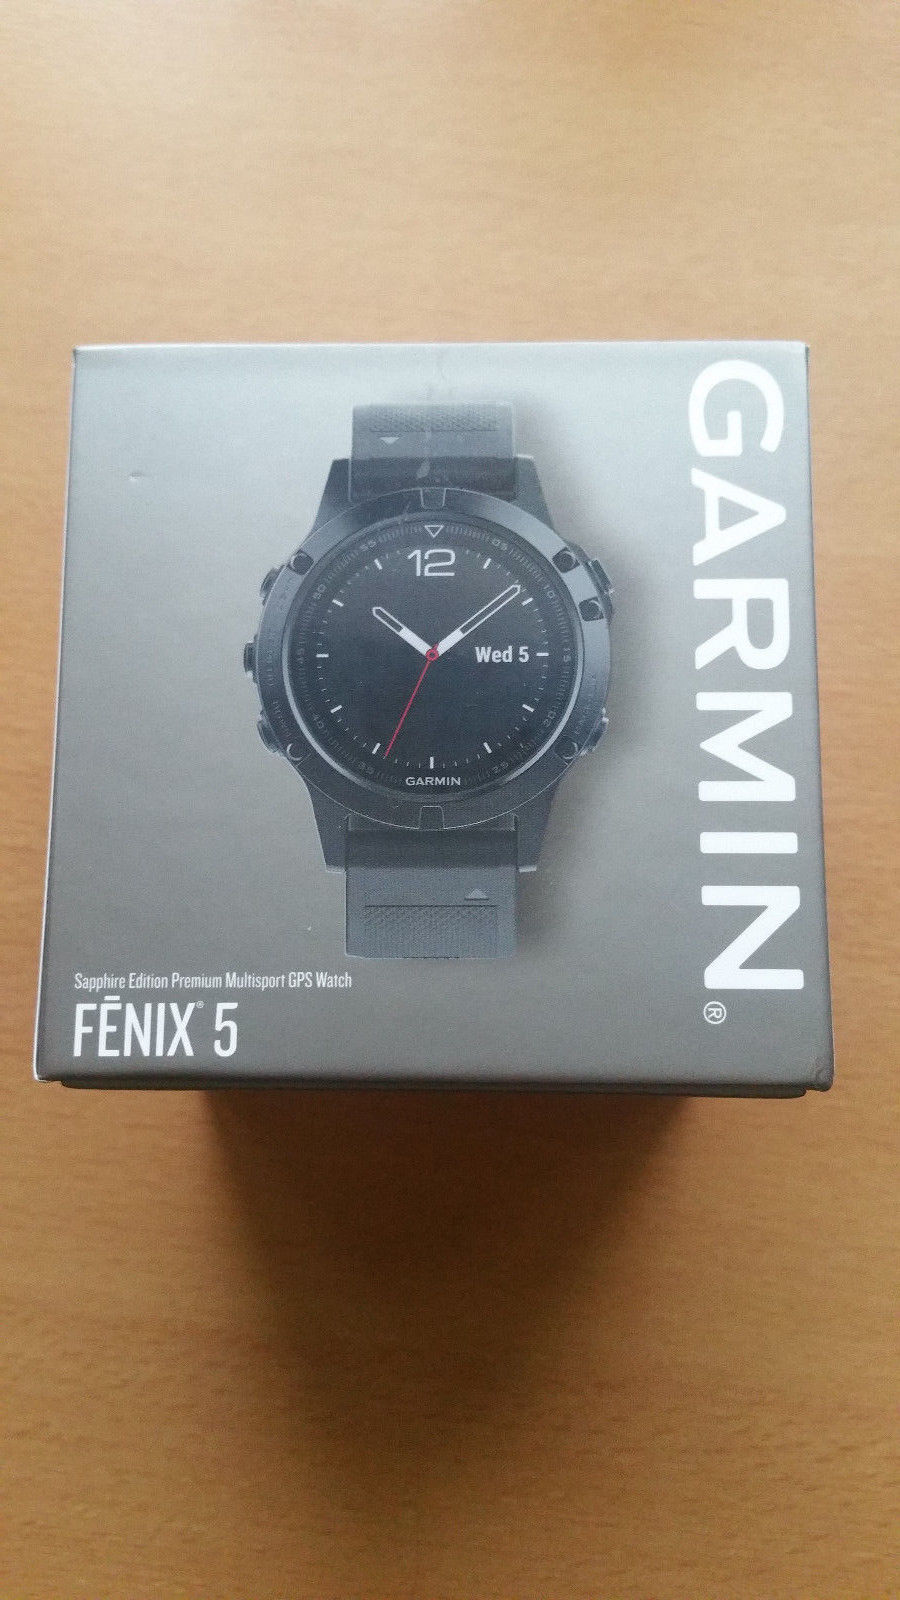 Garmin Fenix 5 Schwarz Sapphire Edition NEU!!!!